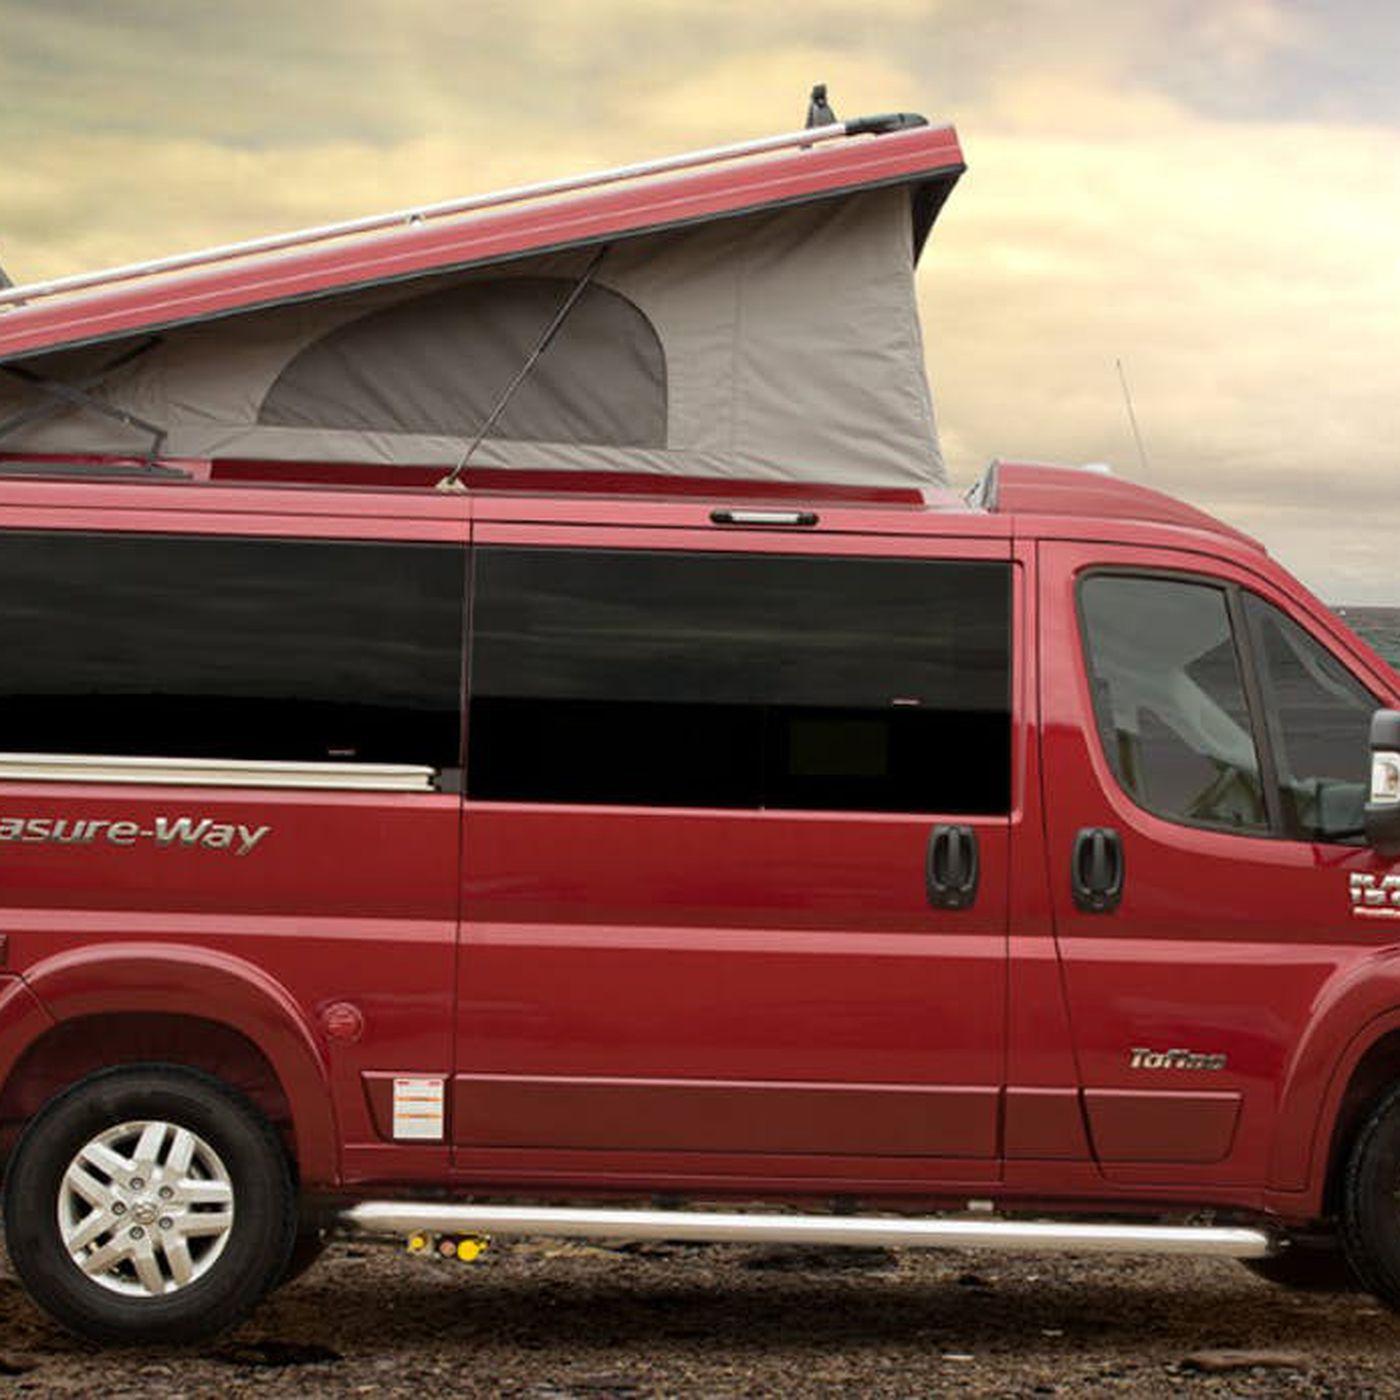 Magnificent Pop Top Camper Van Raises The Roof On Adventure Curbed Home Interior And Landscaping Ponolsignezvosmurscom